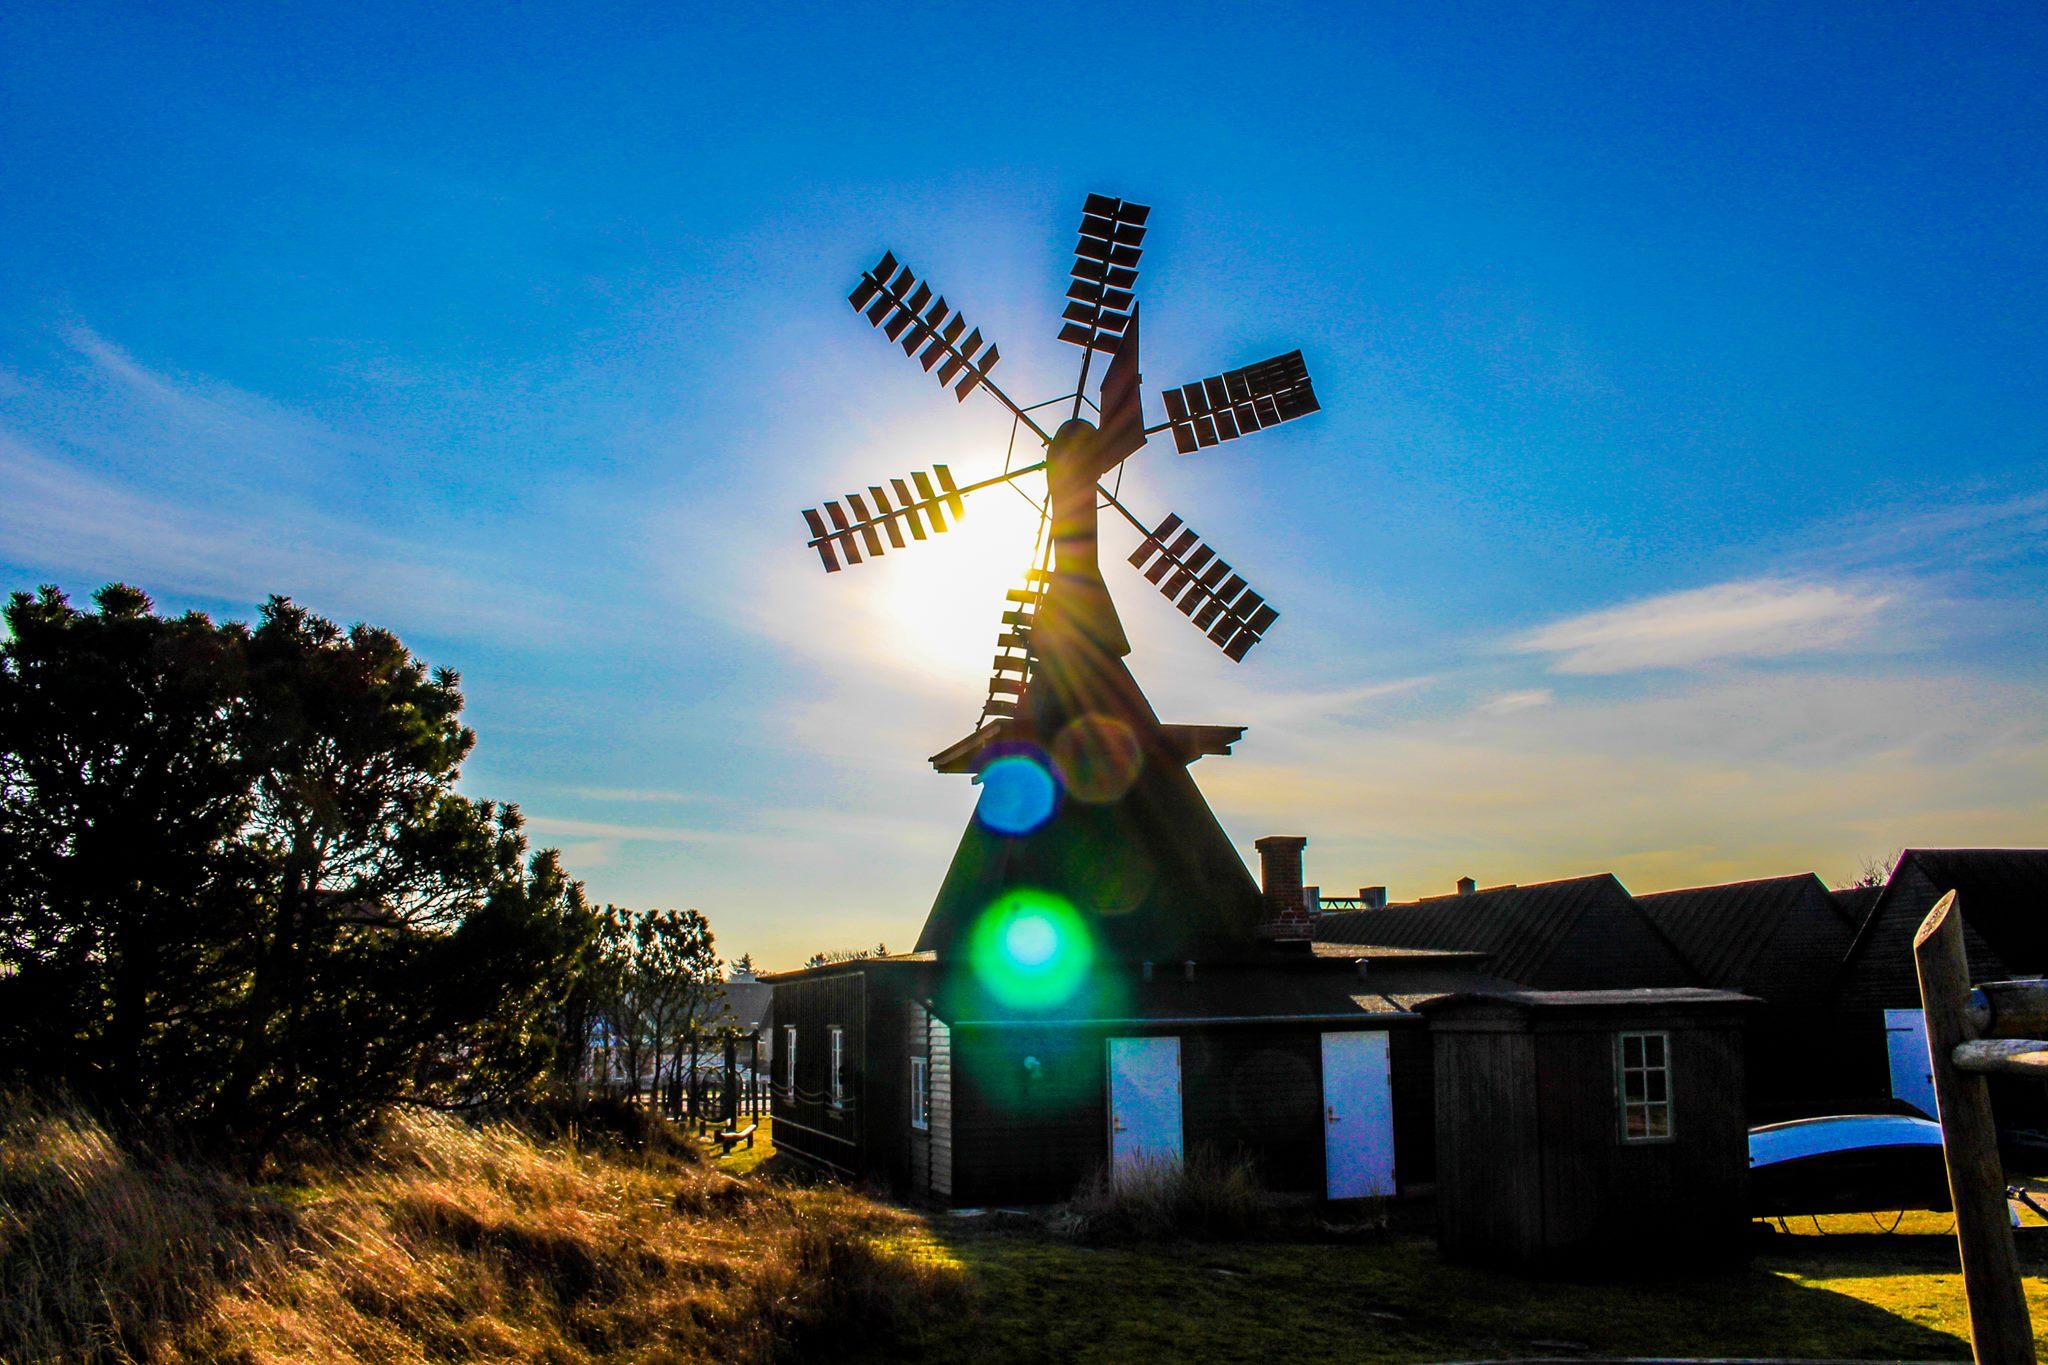 Danske Smørhuller – Insidertipps für Dänemark #38 Nymindegab Museum